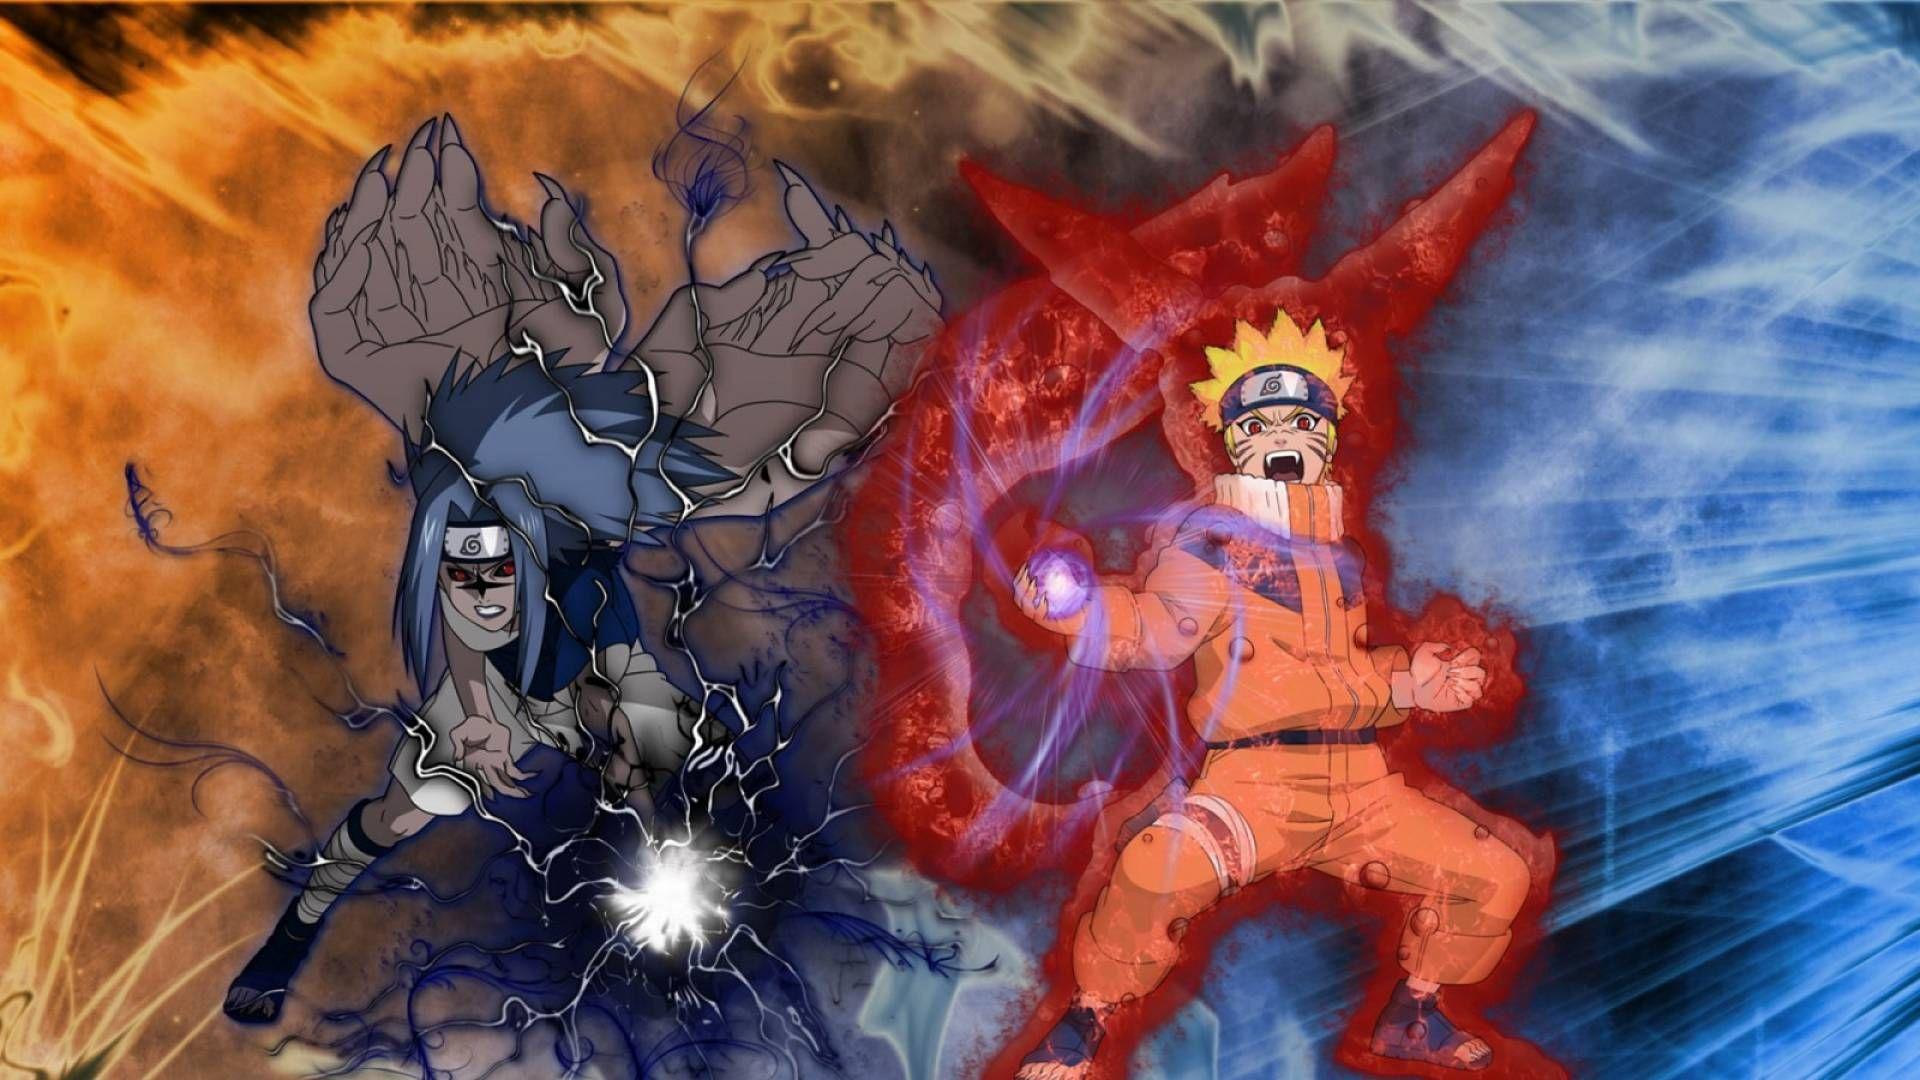 Naruto And Sasuke Wallpaper With Images Wallpaper Naruto